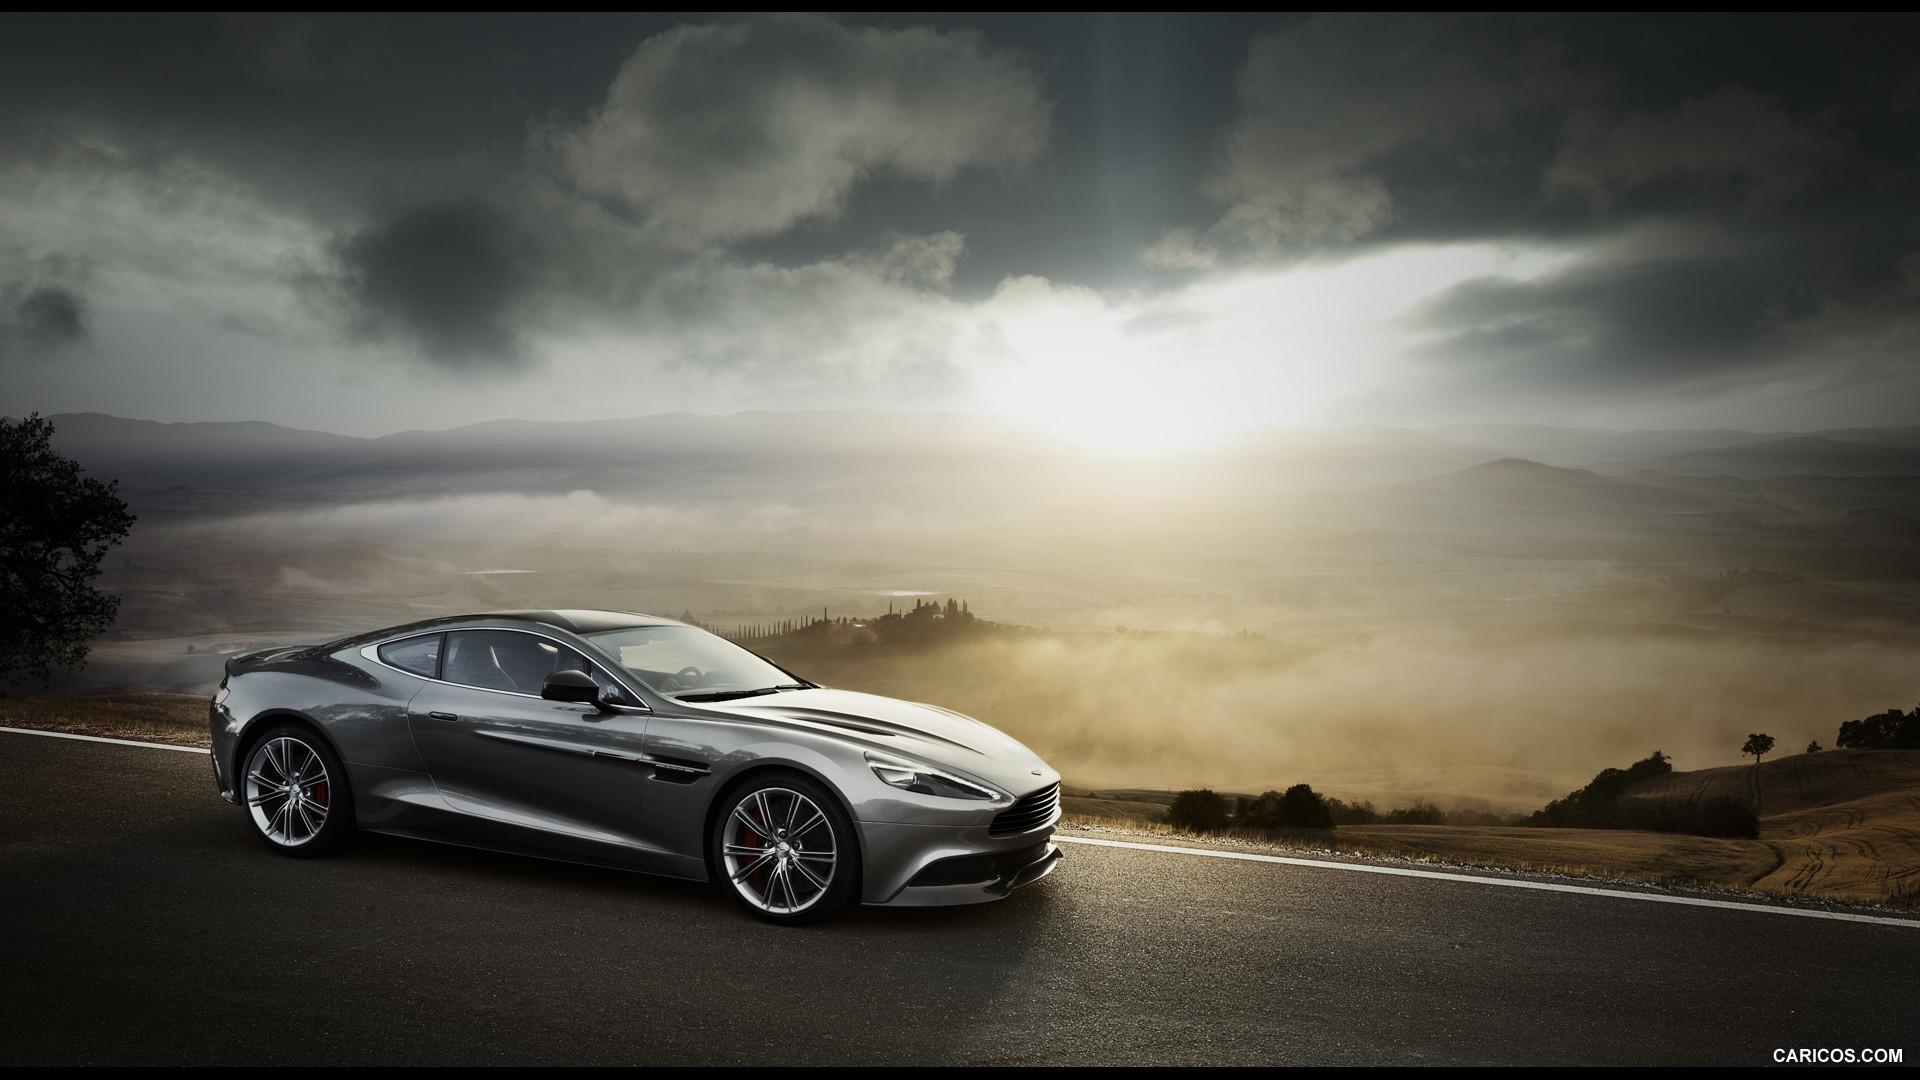 Aston Martin Vanquish 2018 Wallpaper (62+ images)